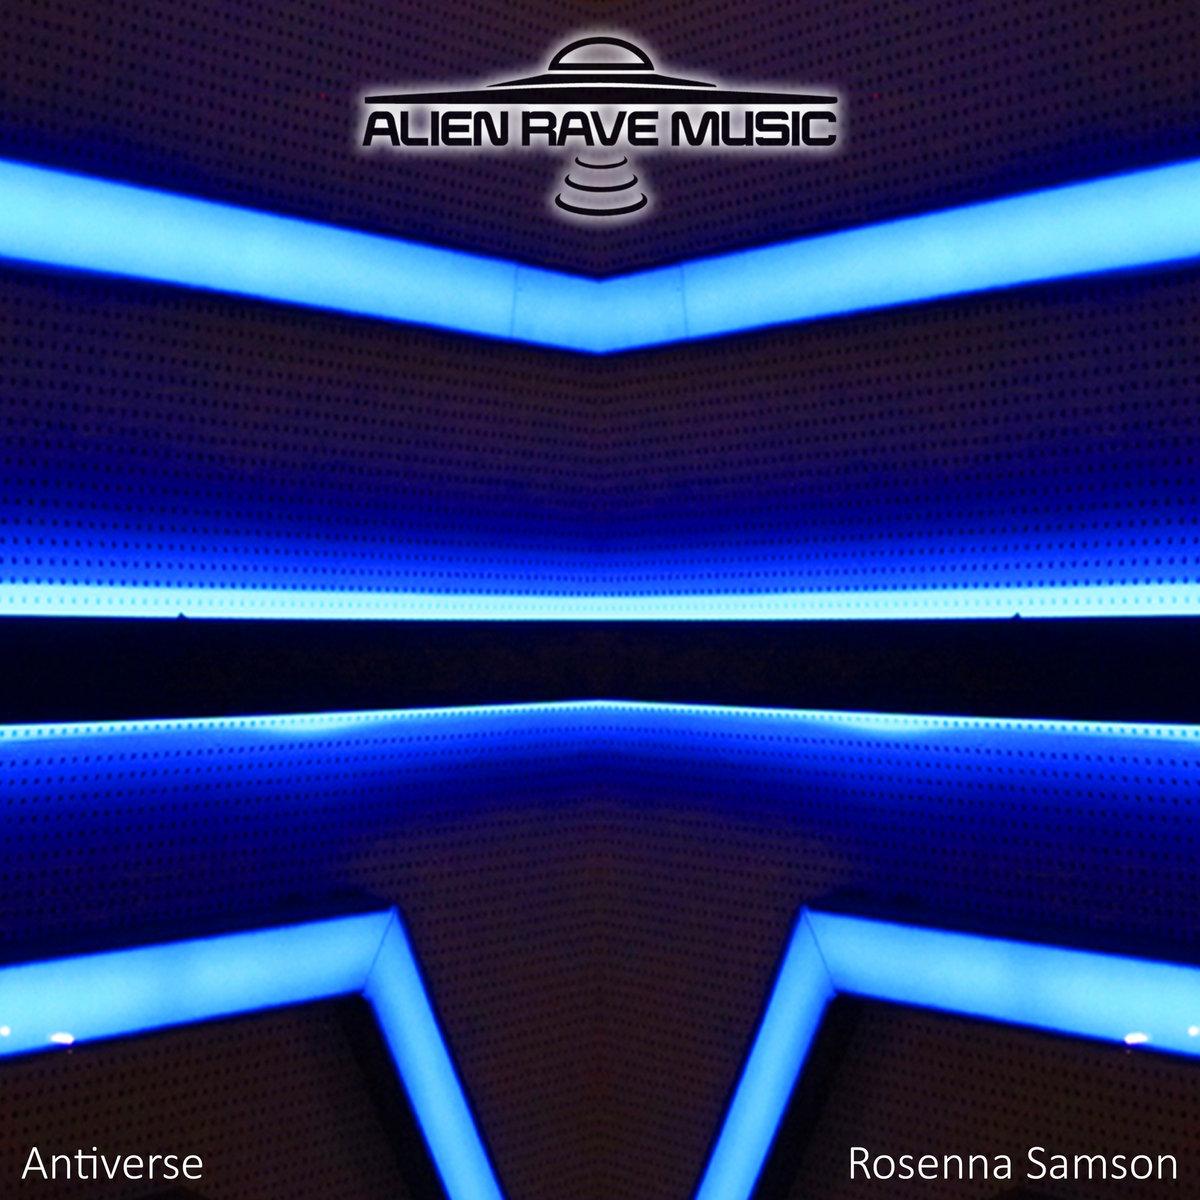 Rosenna Samson - Find Streams of Kindness (Original Mix